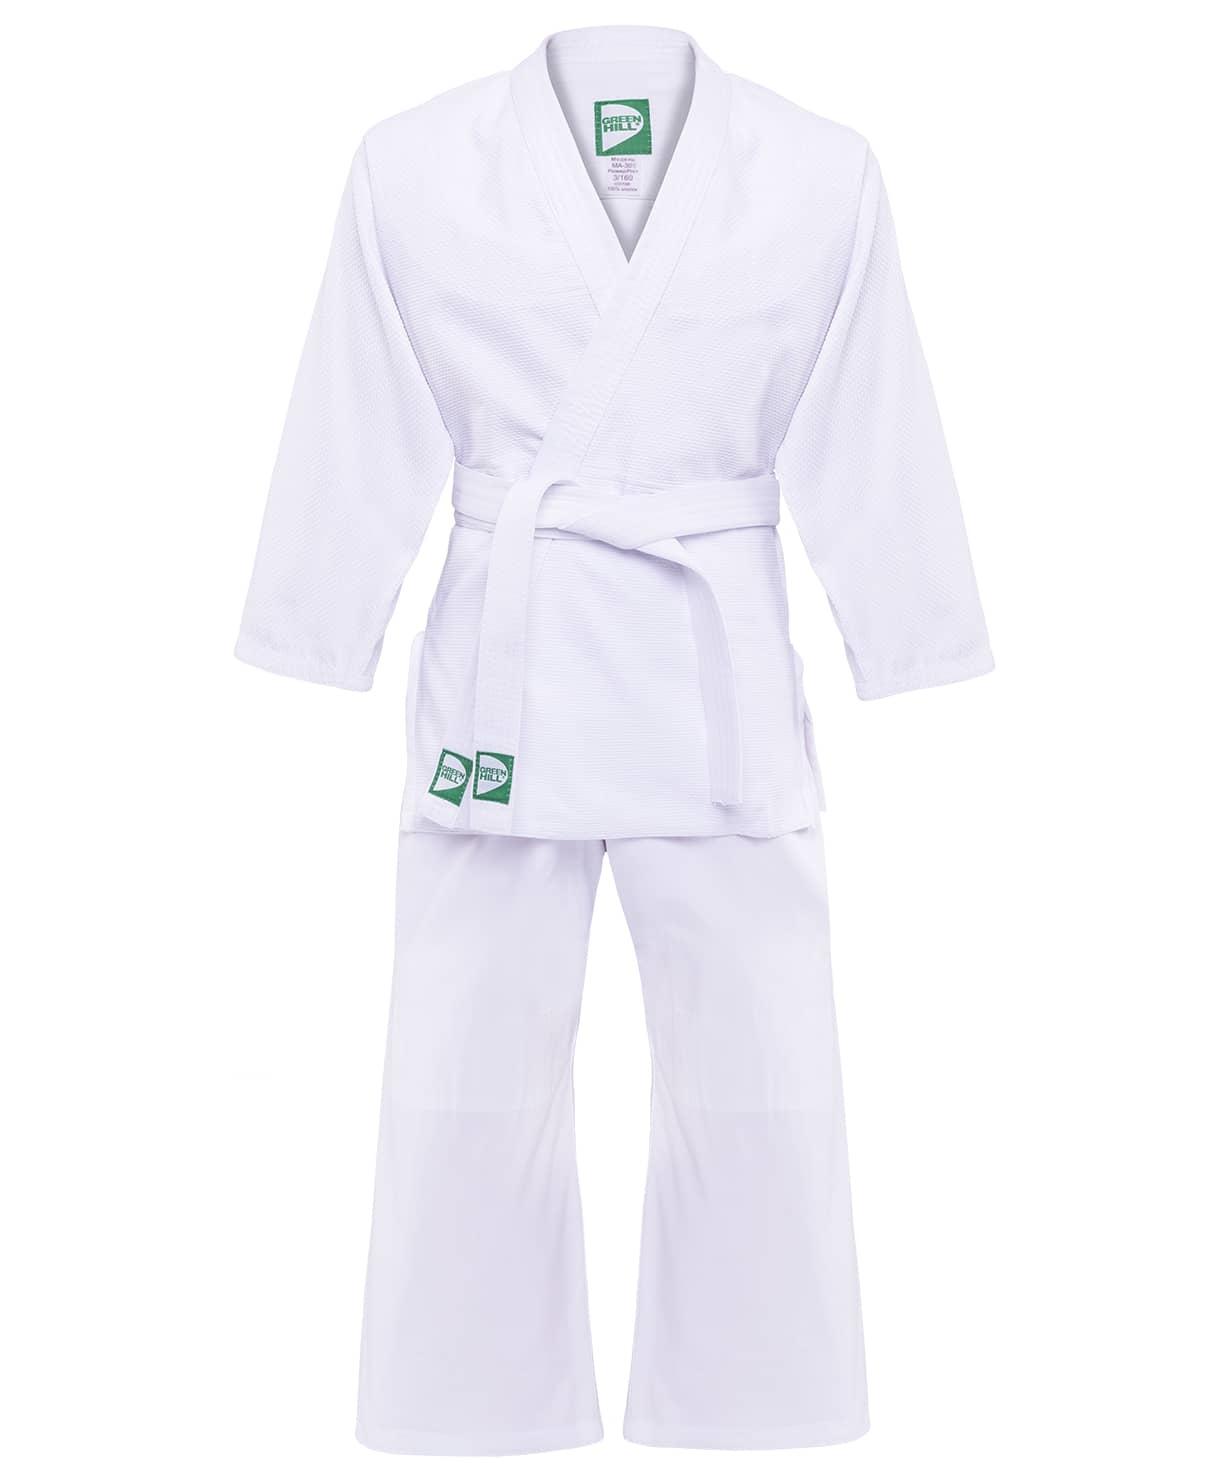 Кимоно для дзюдо MA-302 белый, р.0/130